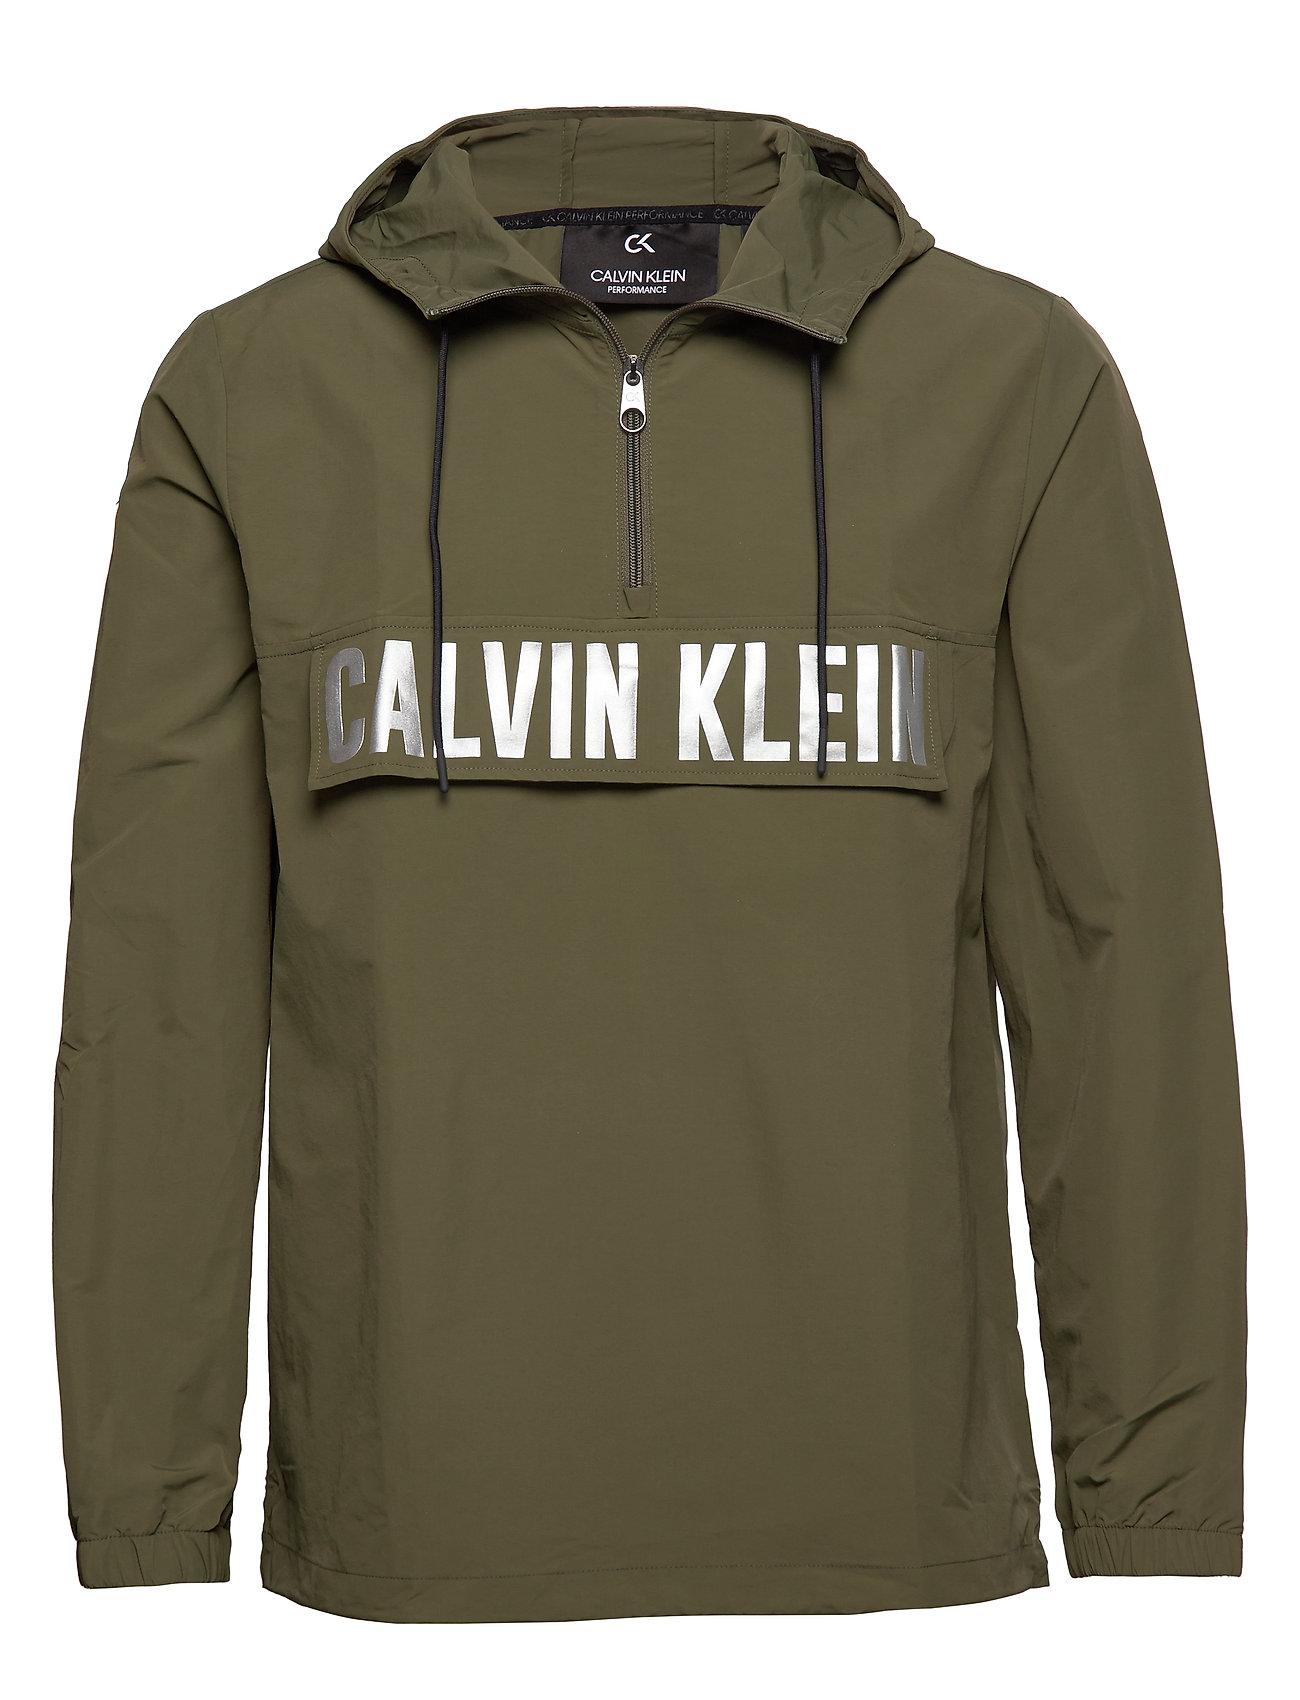 Calvin Klein Performance 1/2 ZIP WOVEN JACKET - GRAPE LEAF